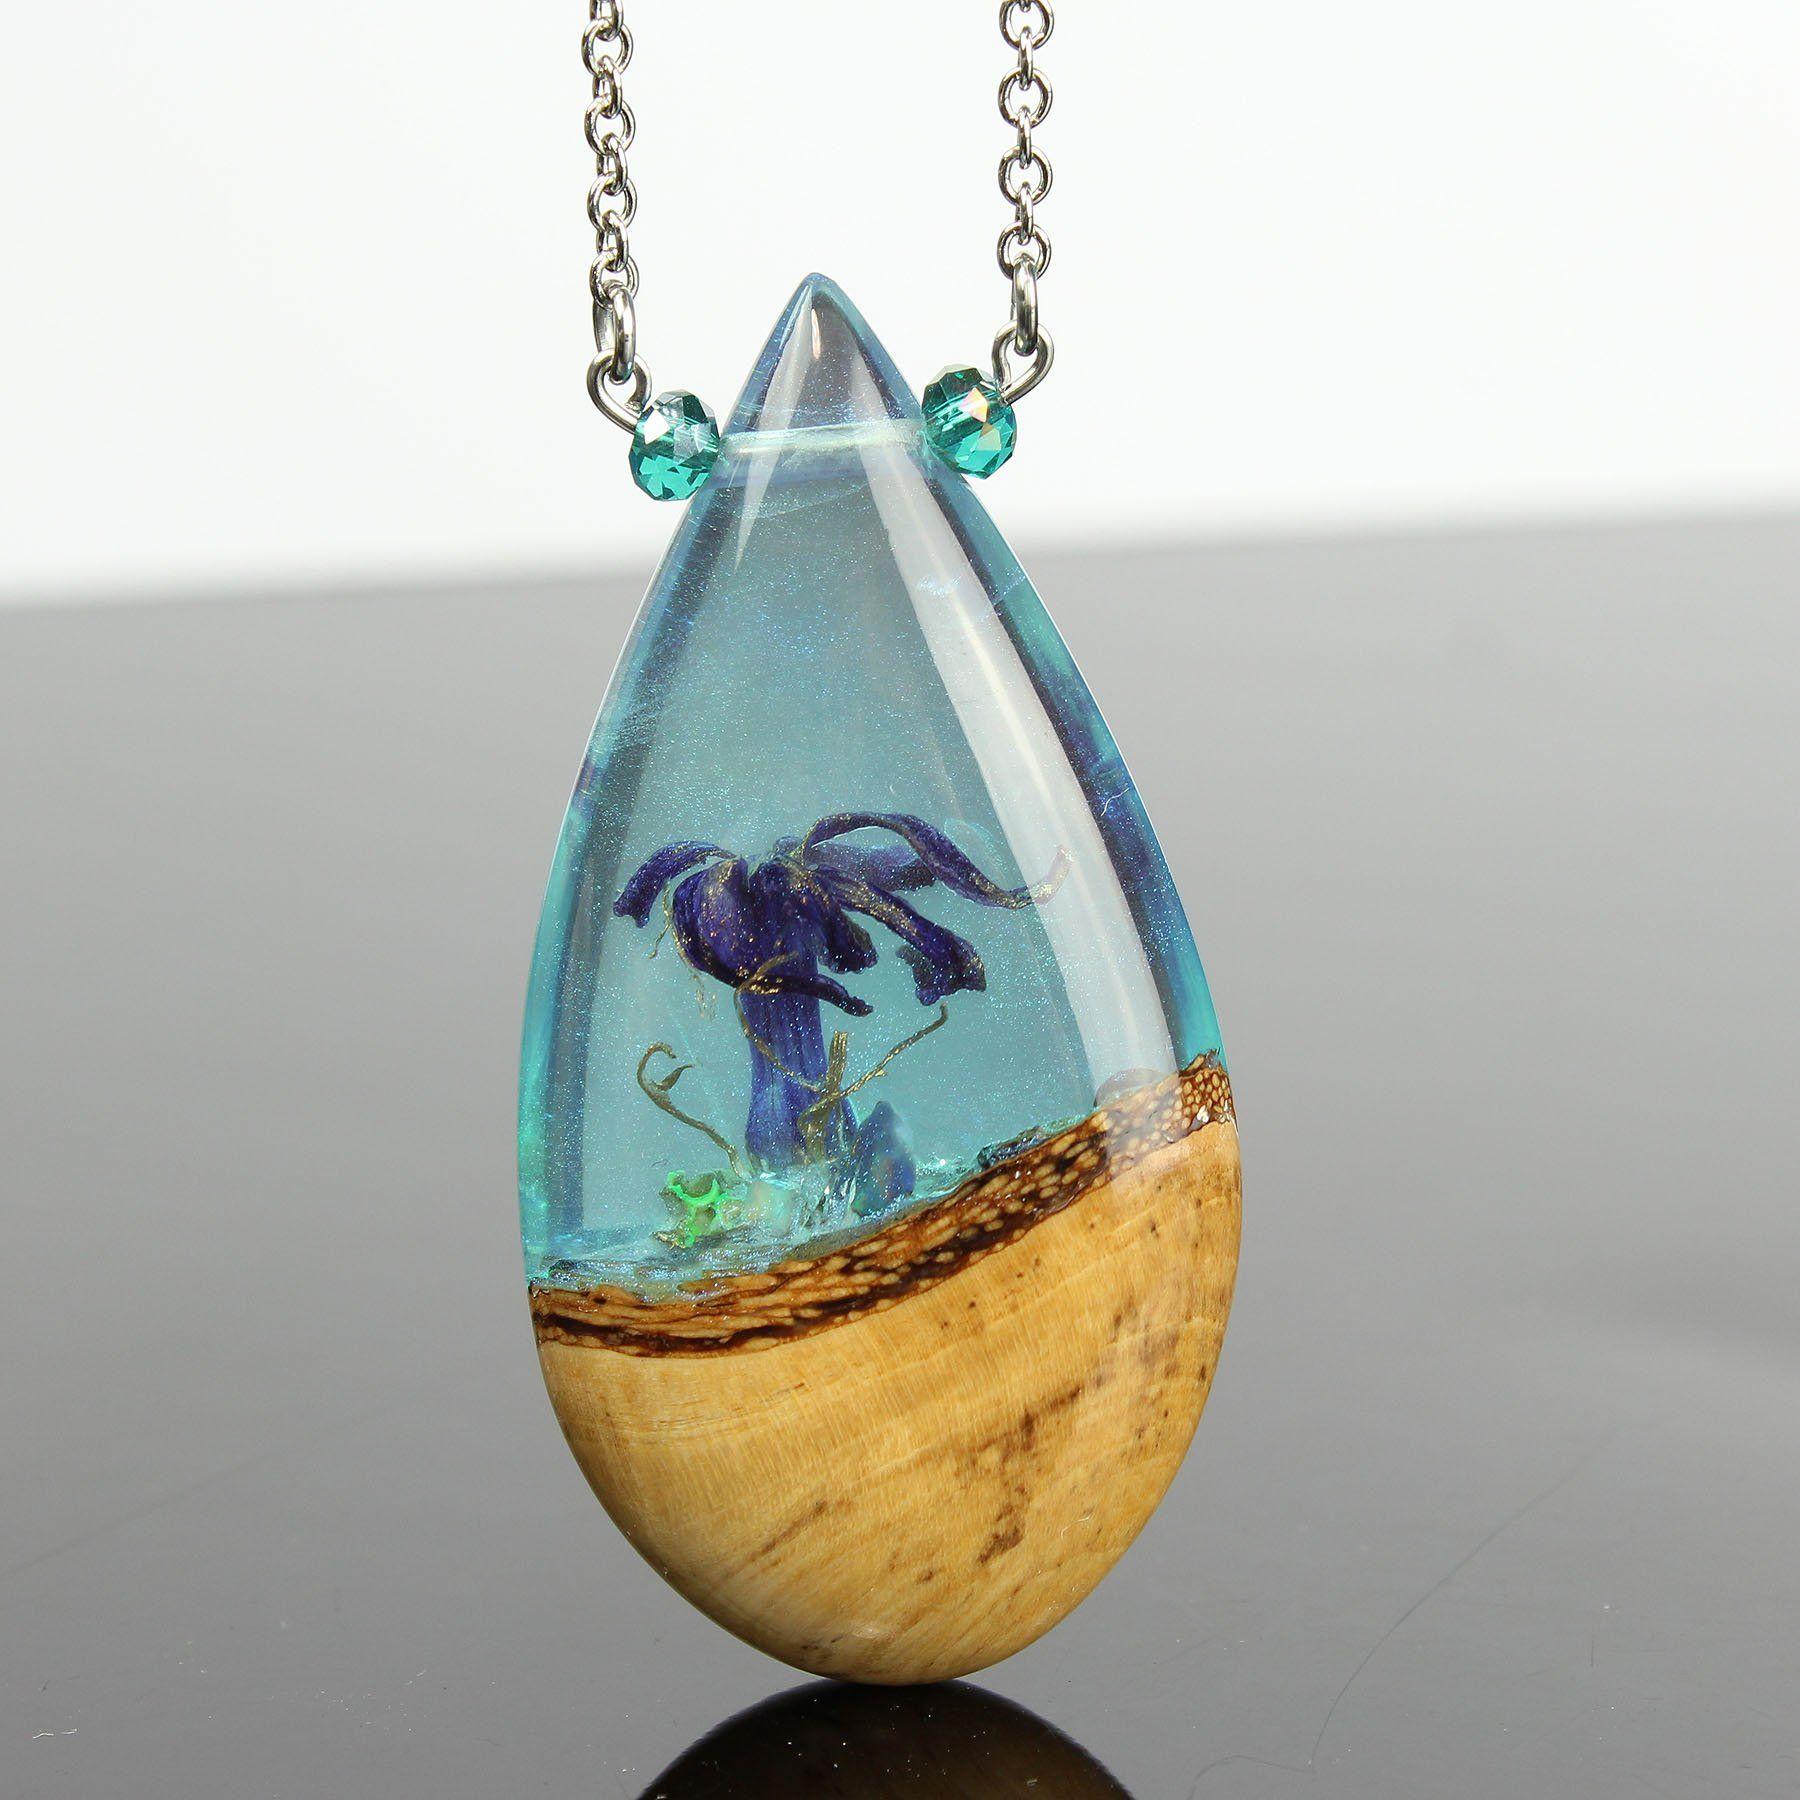 Handmade Iridescent Pendant